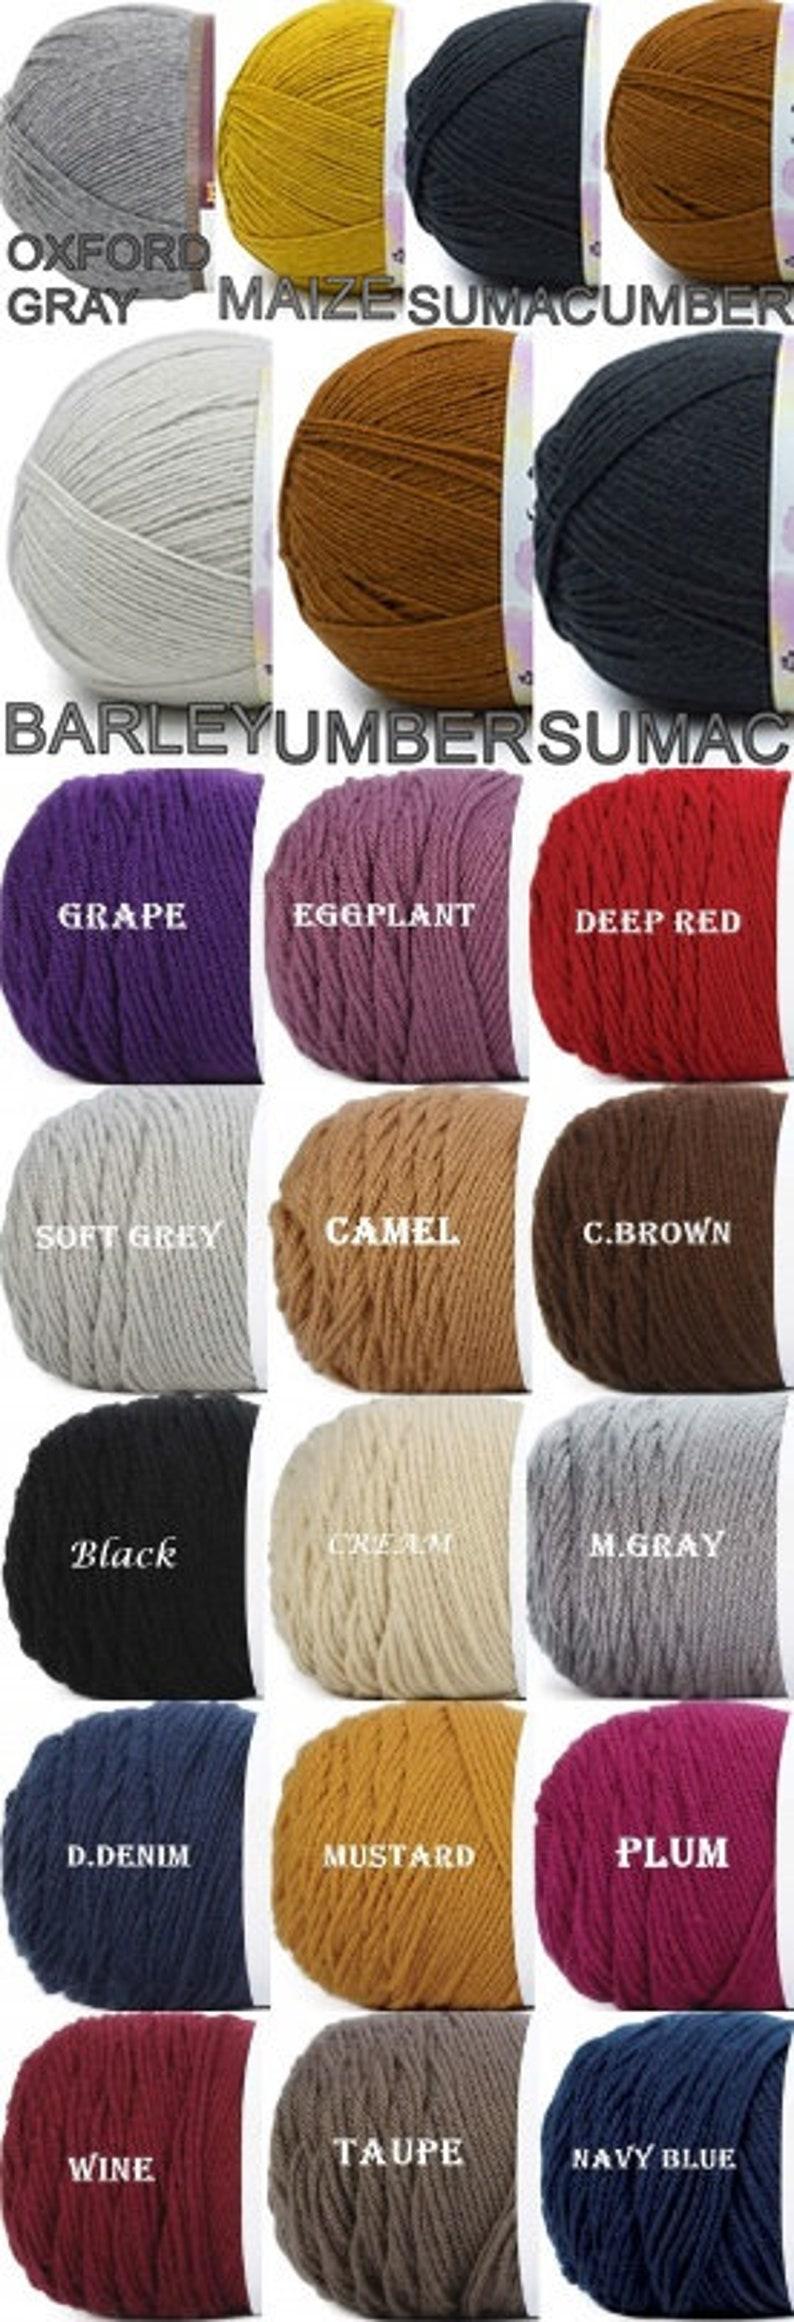 Chunky Men/'s hat,Winter Rib beanie,warm beanie,,Fishermen hat,Toddler hat,Boys Girl/'s Beanie,Crochet Daddy/&Me HATS,Matching hats,Knit hat